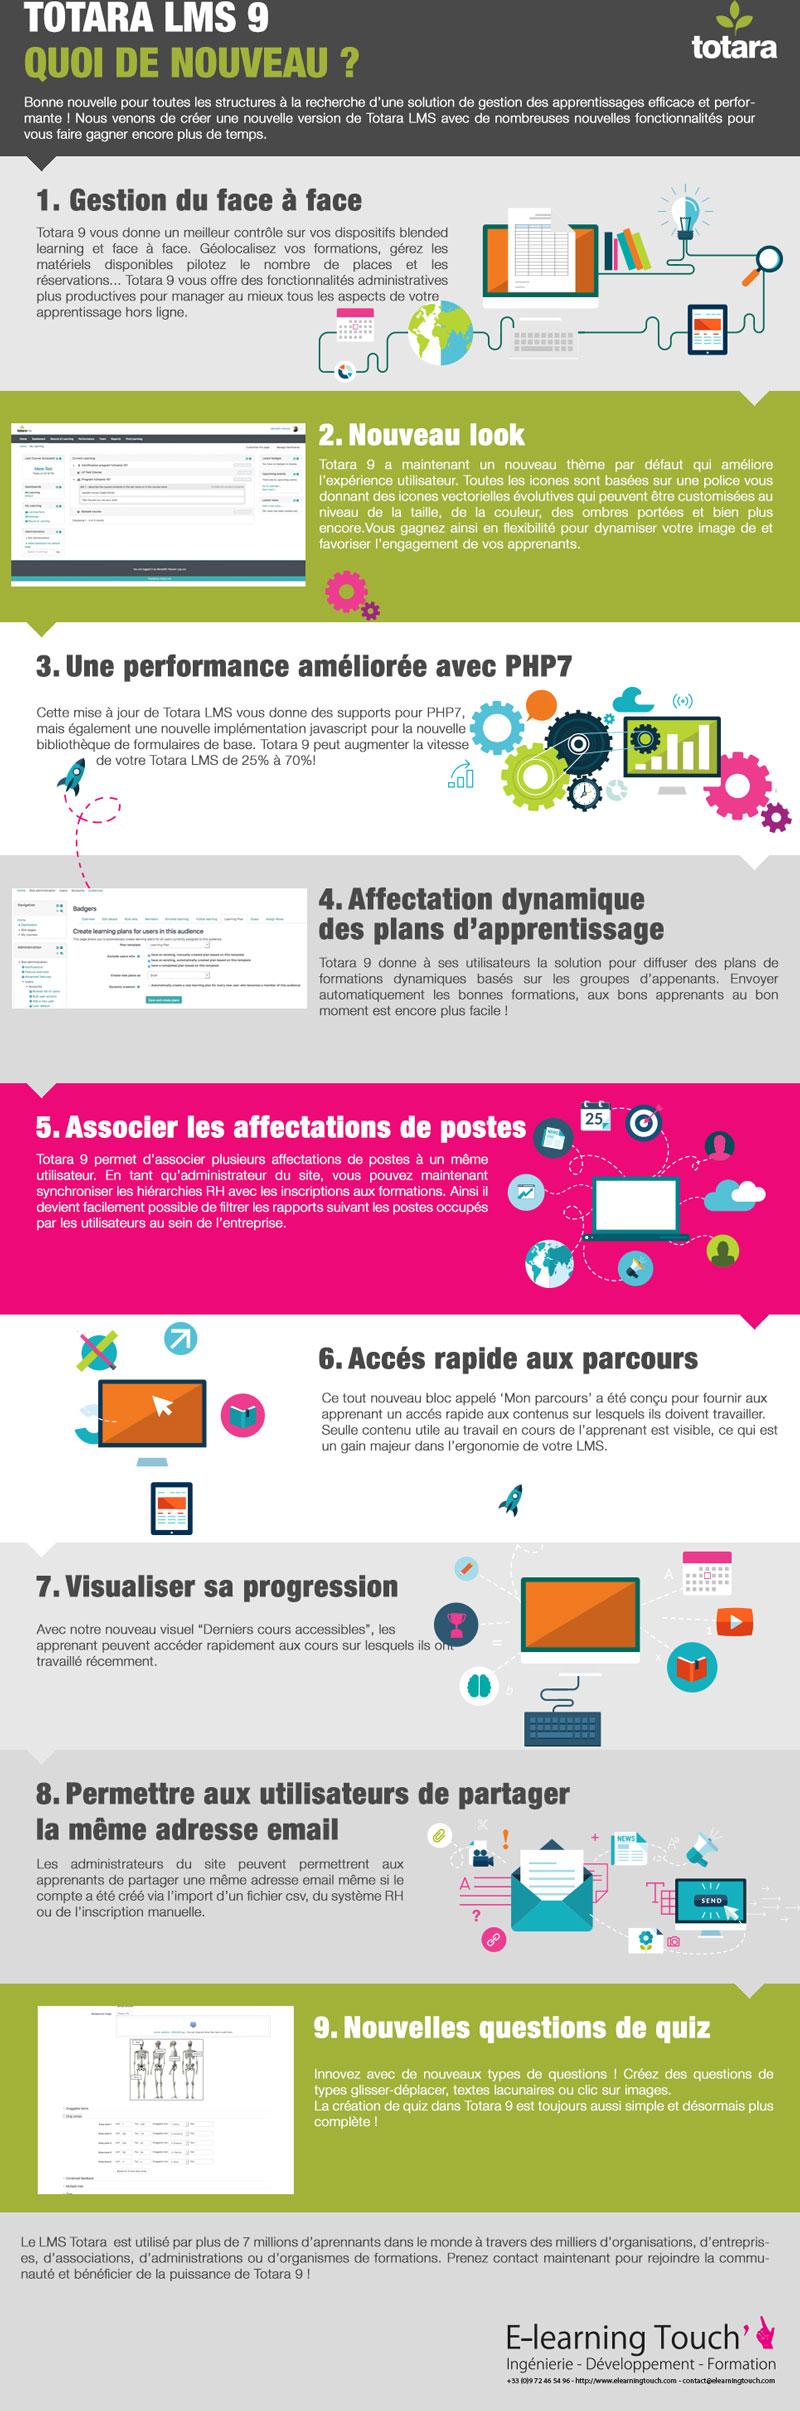 totara-9_infographic_jf